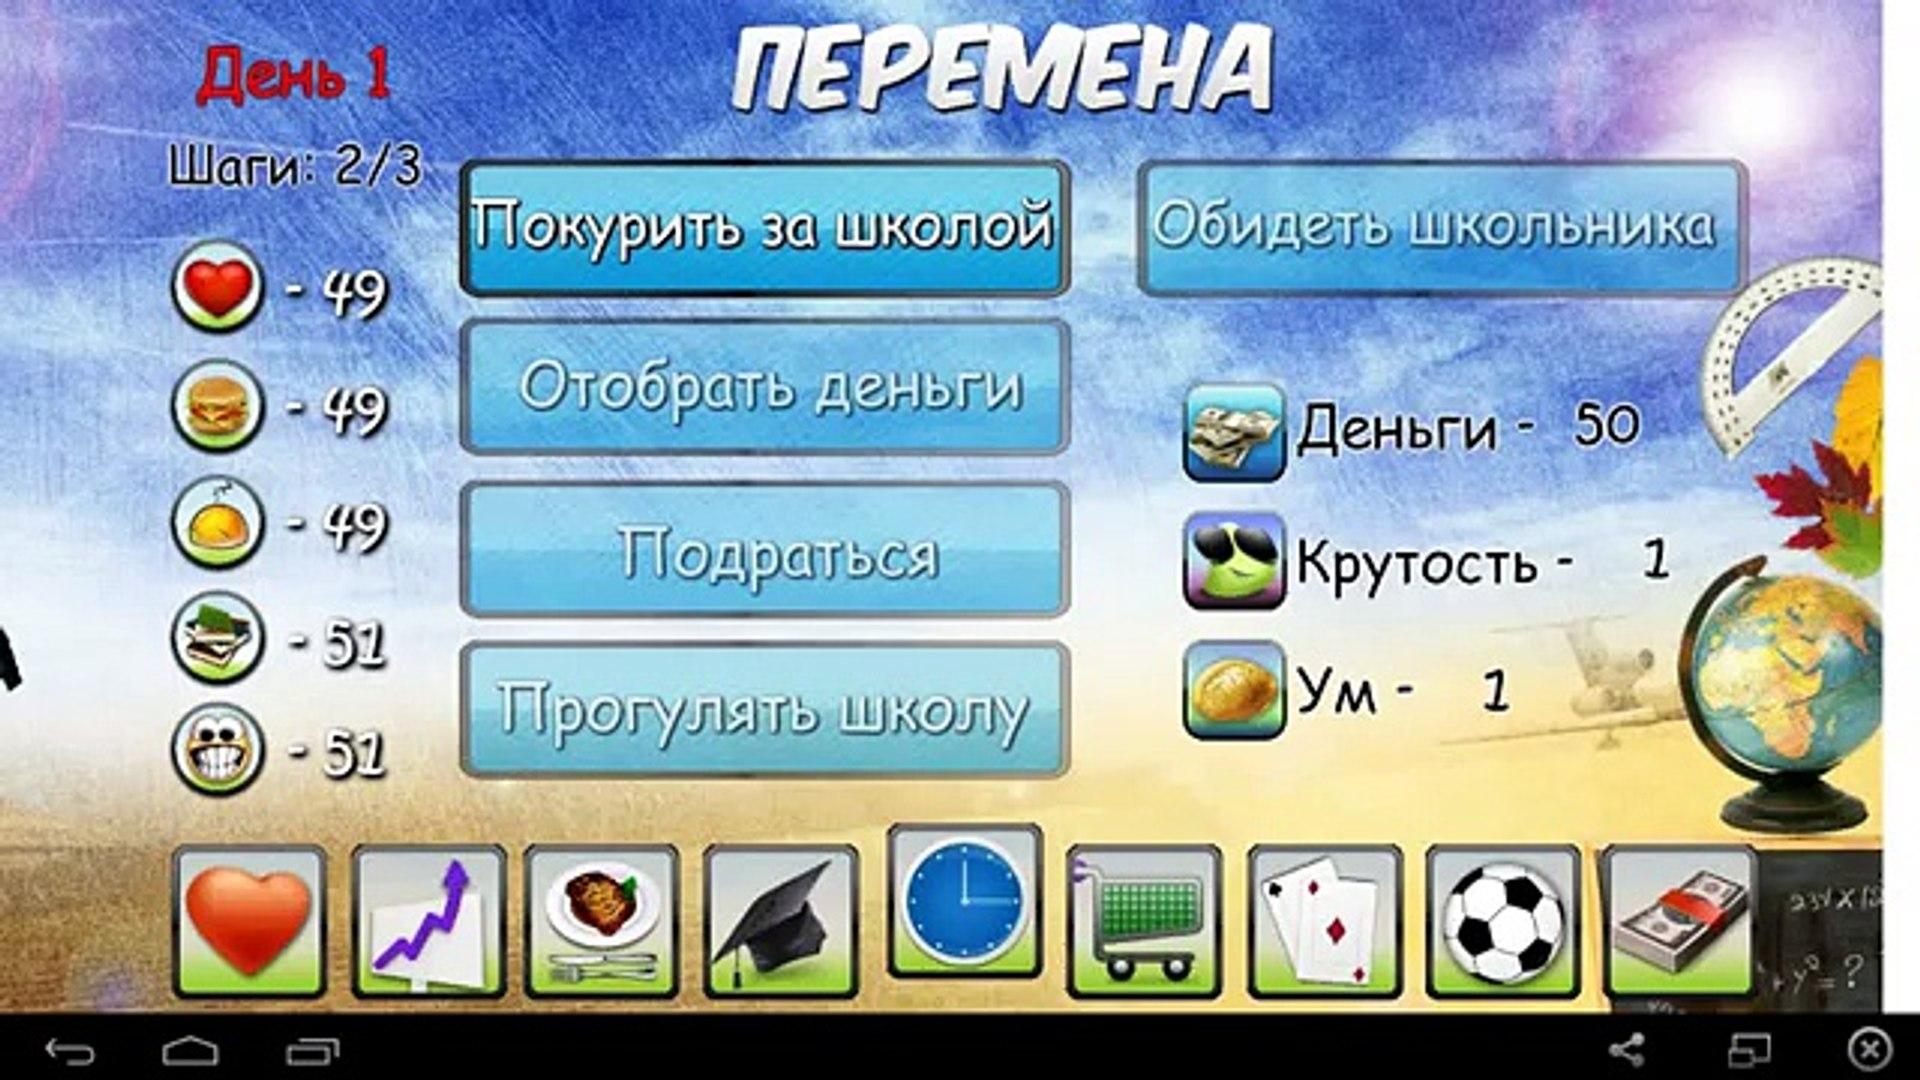 Симулятор школьника / Simulator disciple - for Android GamePlay